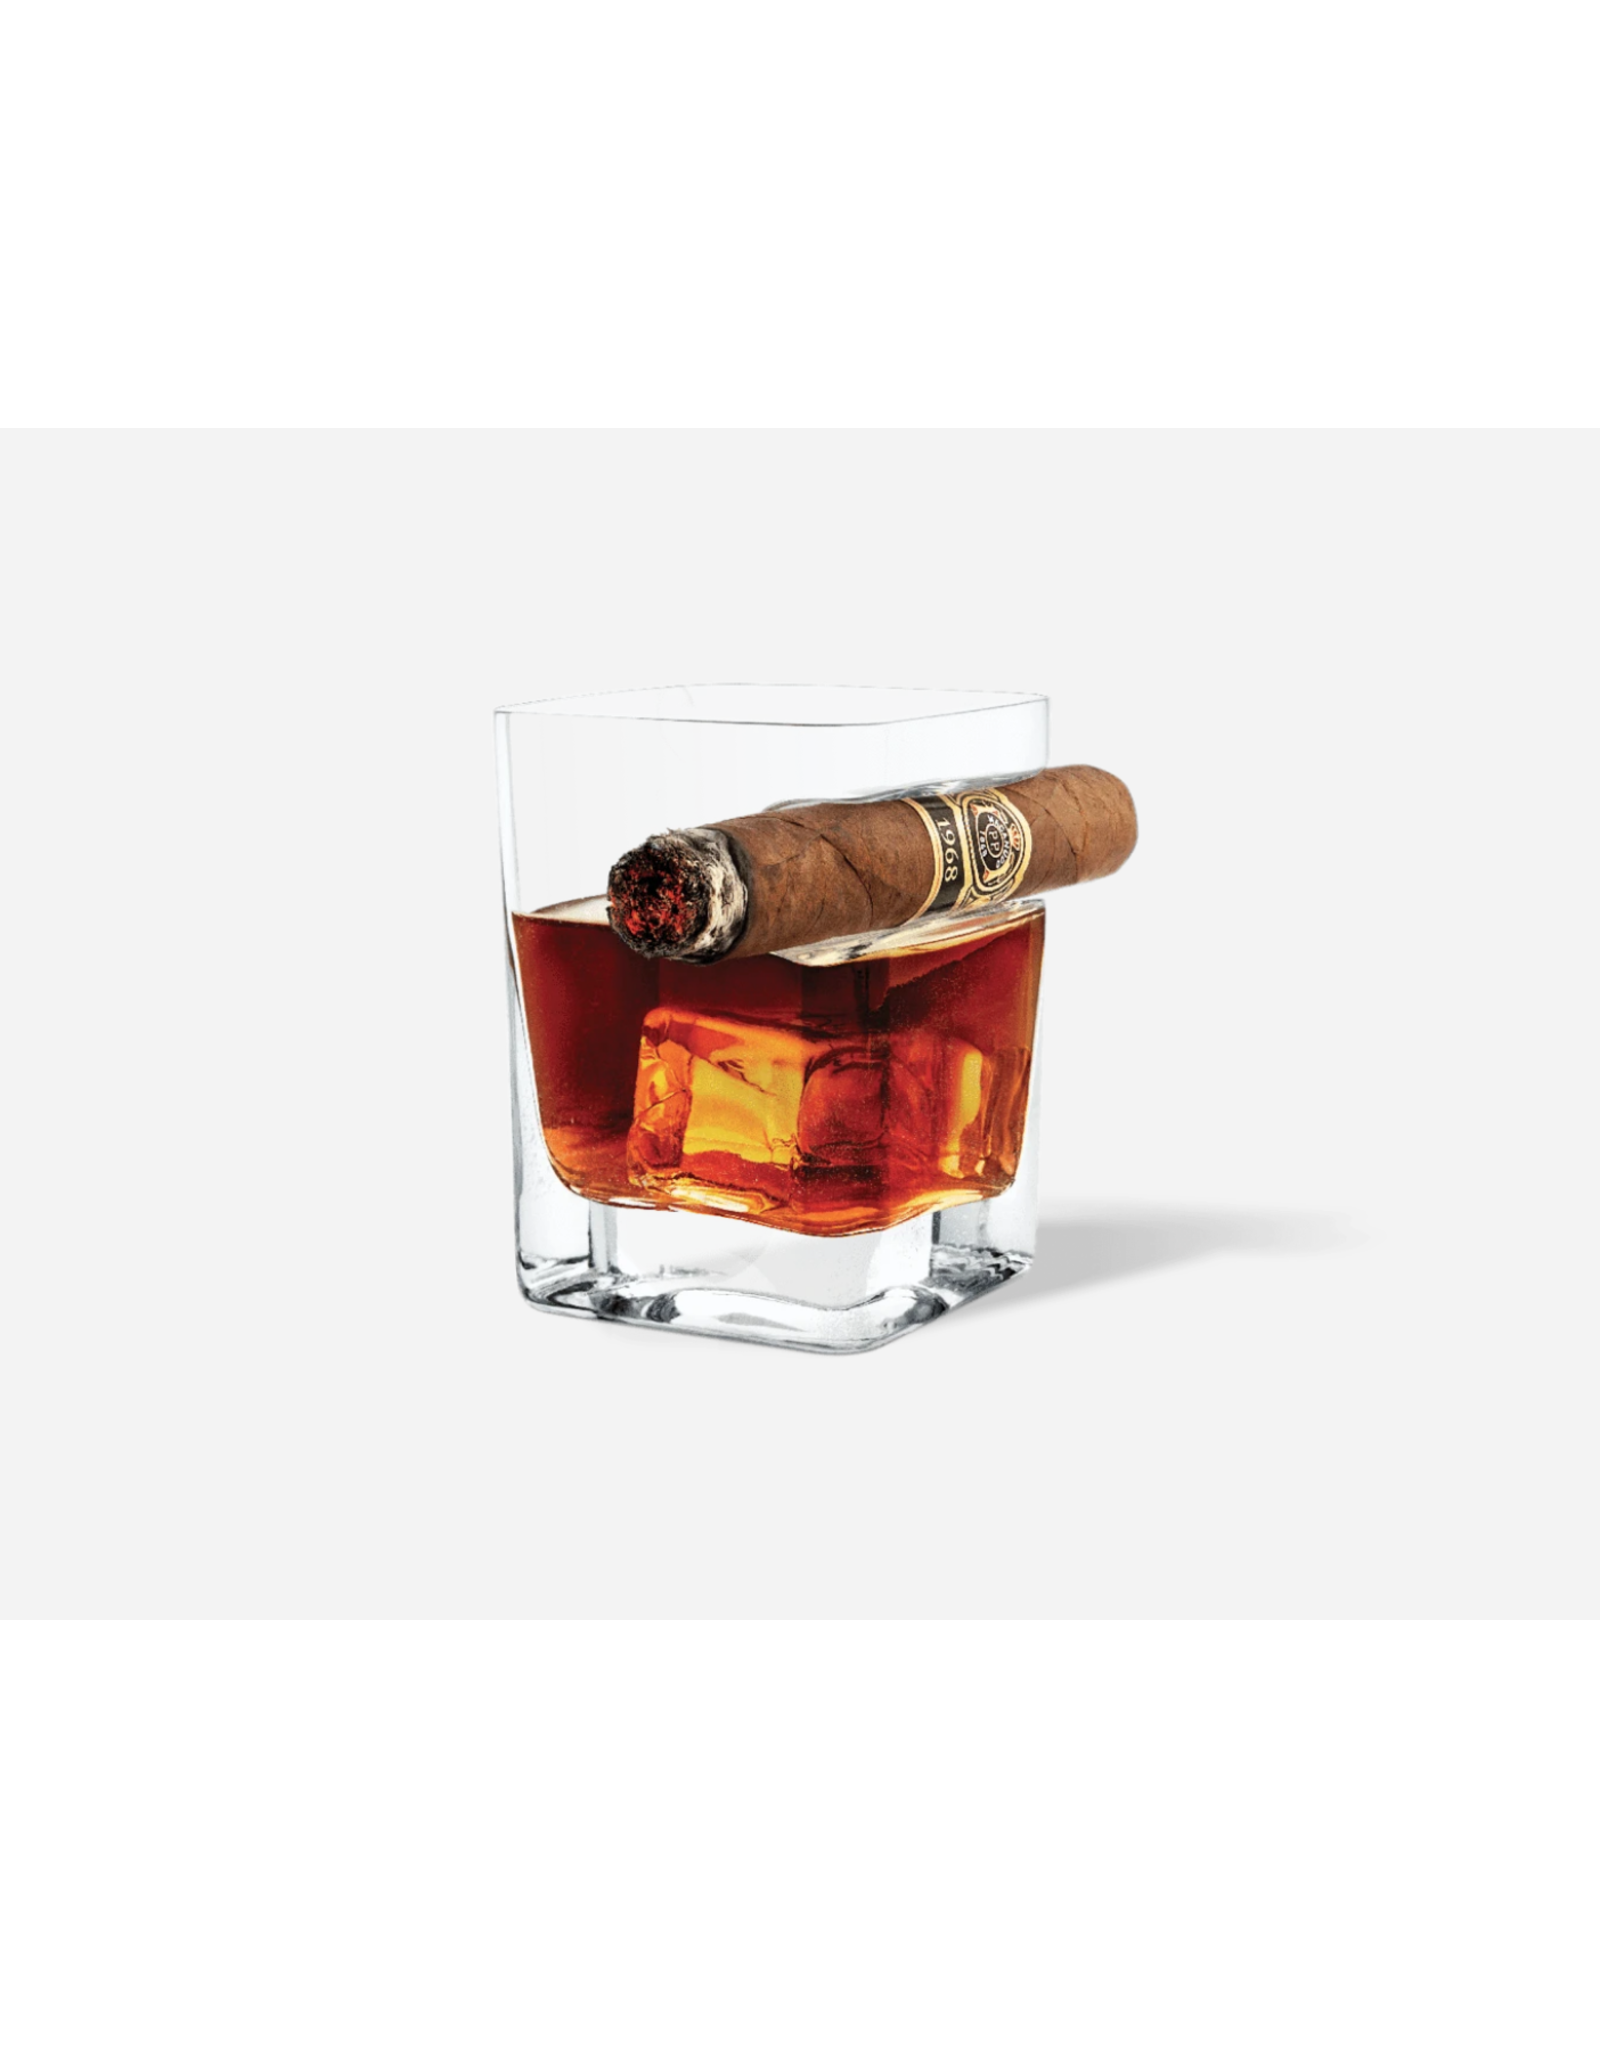 Corkcicle Corkcicle Cigar Glass, single